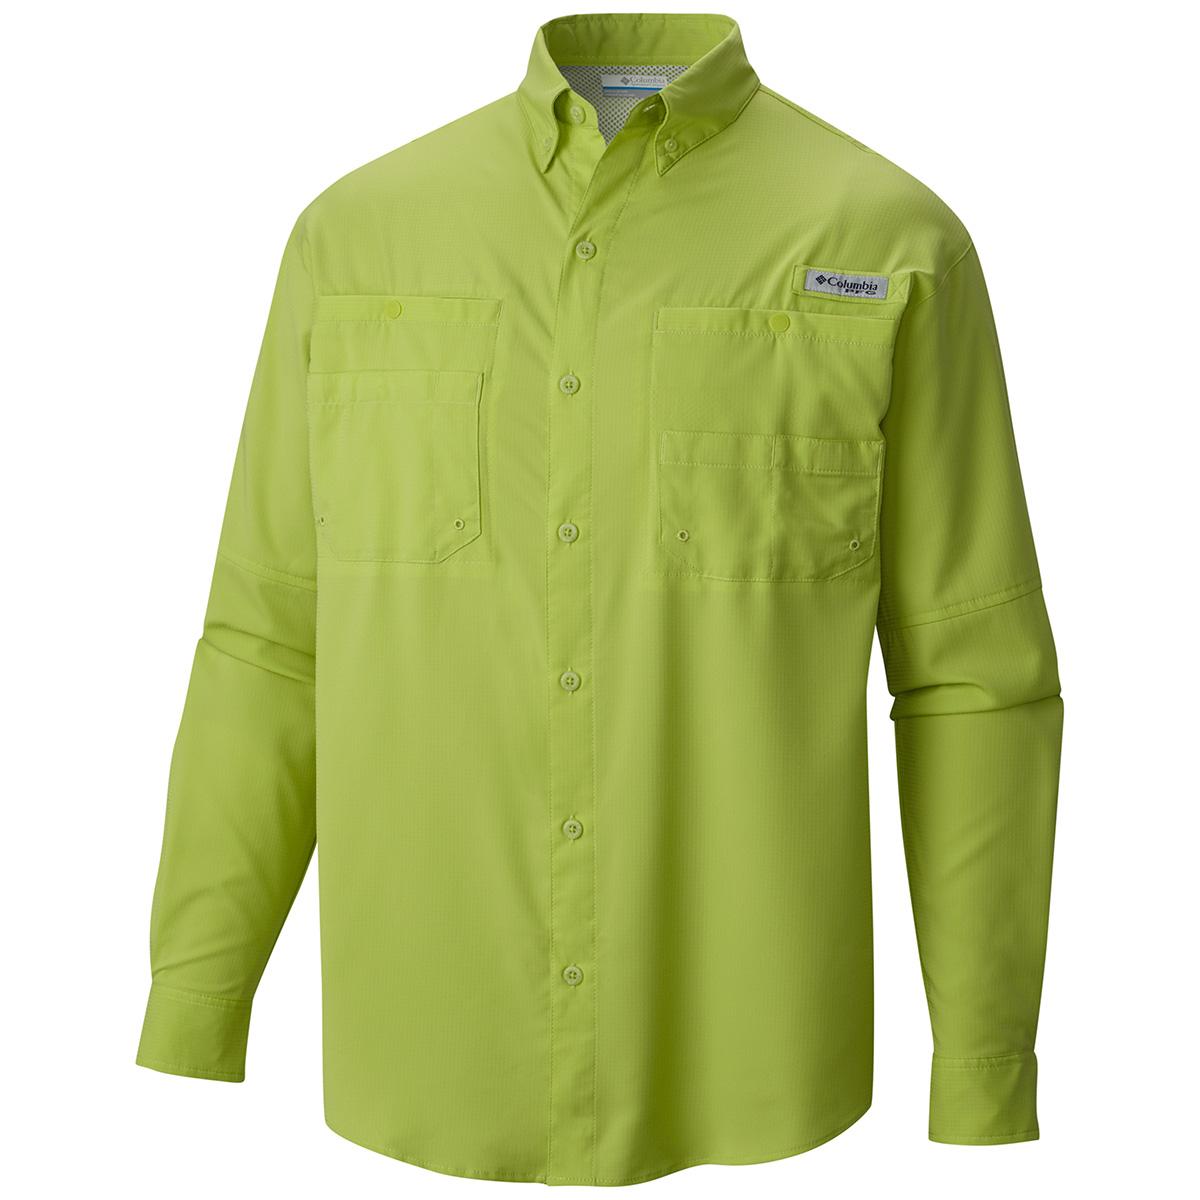 Columbia tamiami ii ls shirt fishing shirts ebay for Two fish apparel